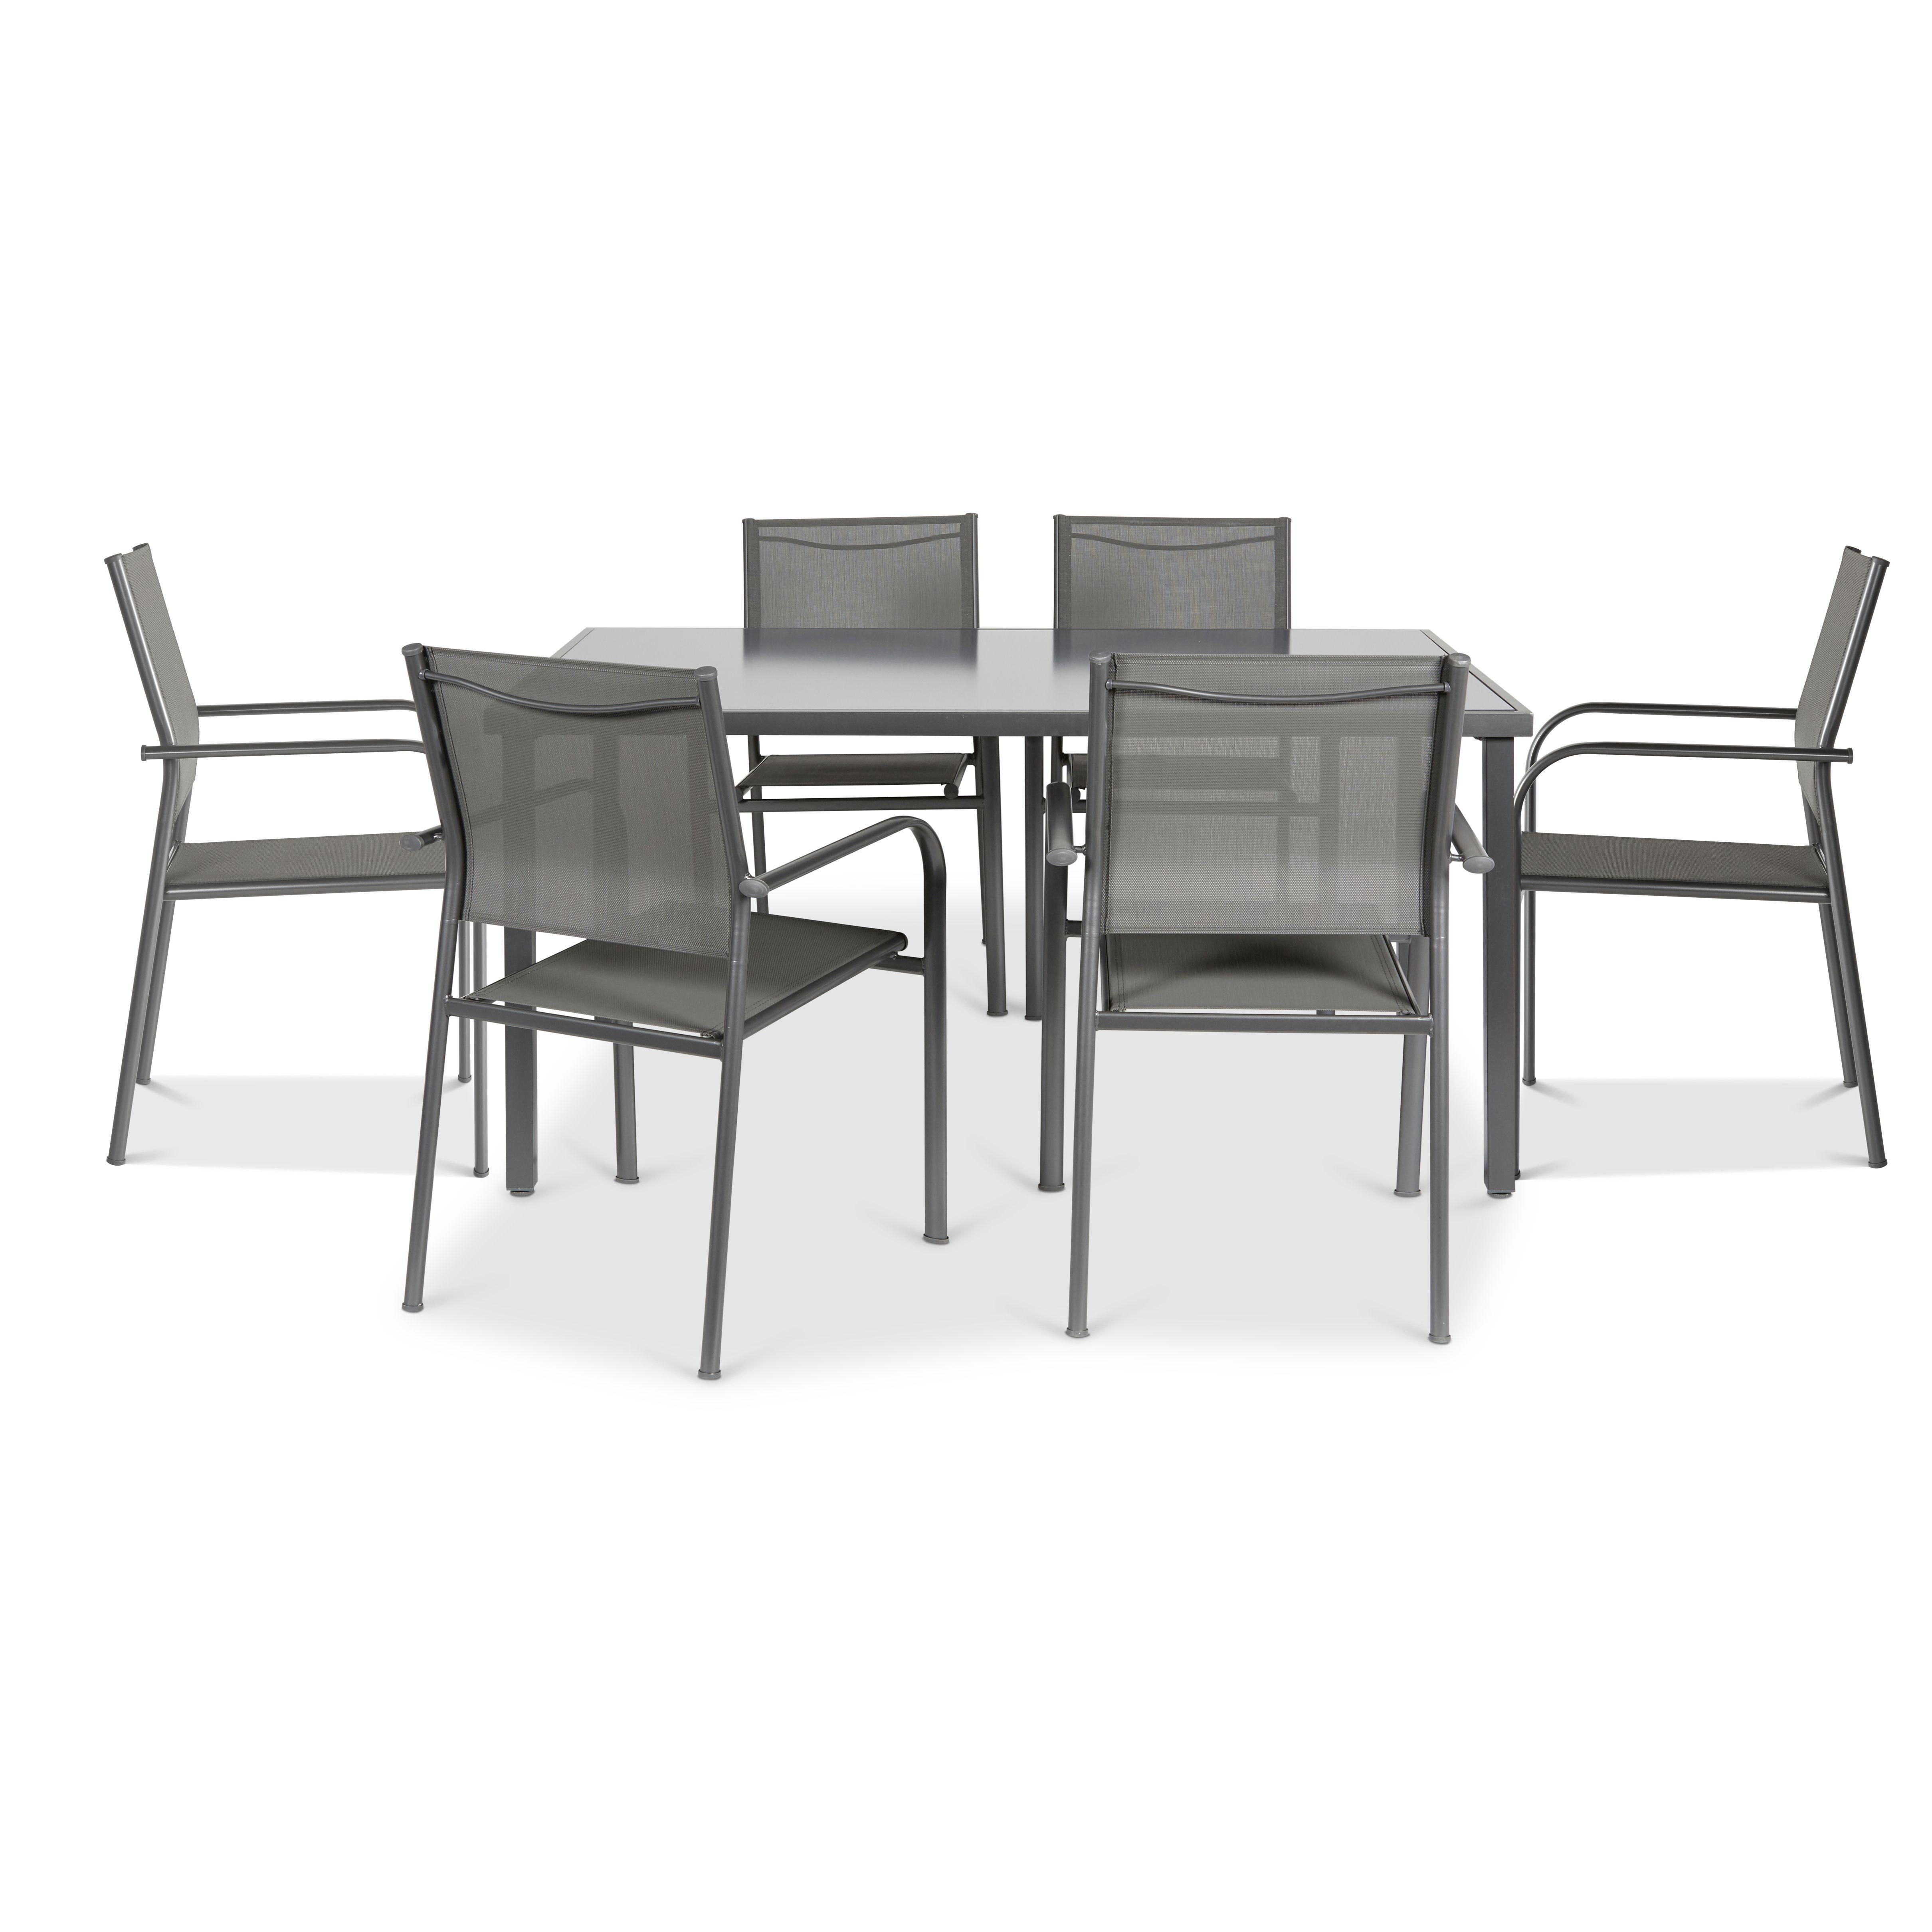 Sensational Dallas Metal 6 Seater Dining Set Departments Diy At Bq Creativecarmelina Interior Chair Design Creativecarmelinacom